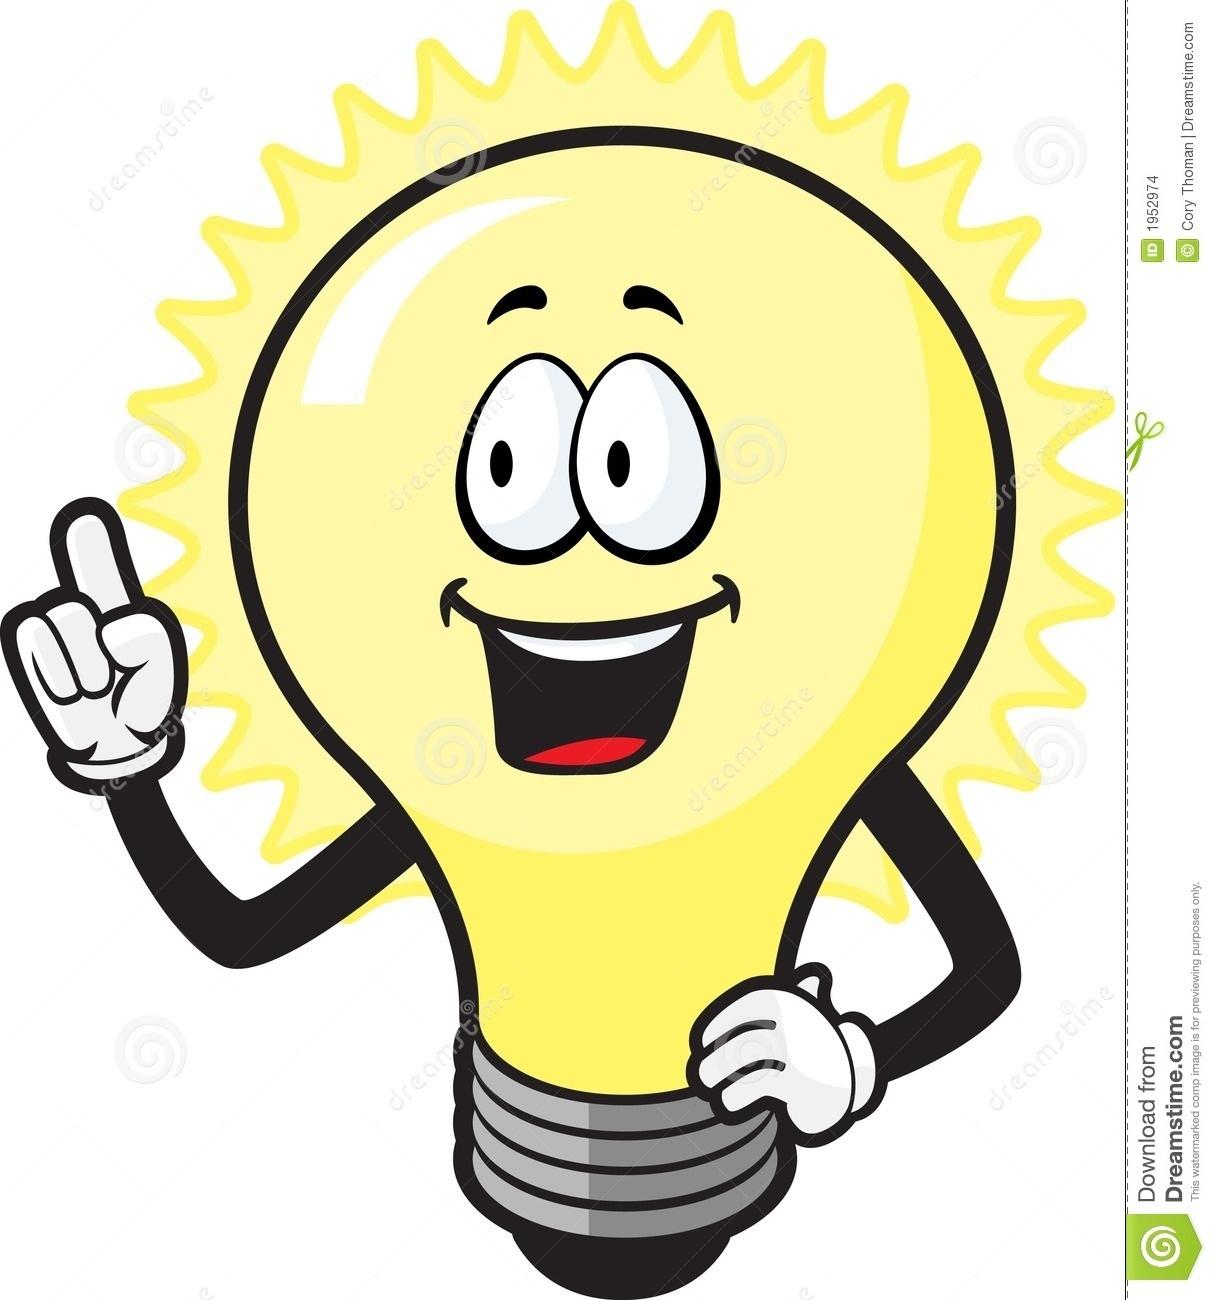 9 lightbulb clipart preview thinking light bu hdclipartall rh hdclipartall com Webelos Arrow of Light cub scouts arrow of light clipart